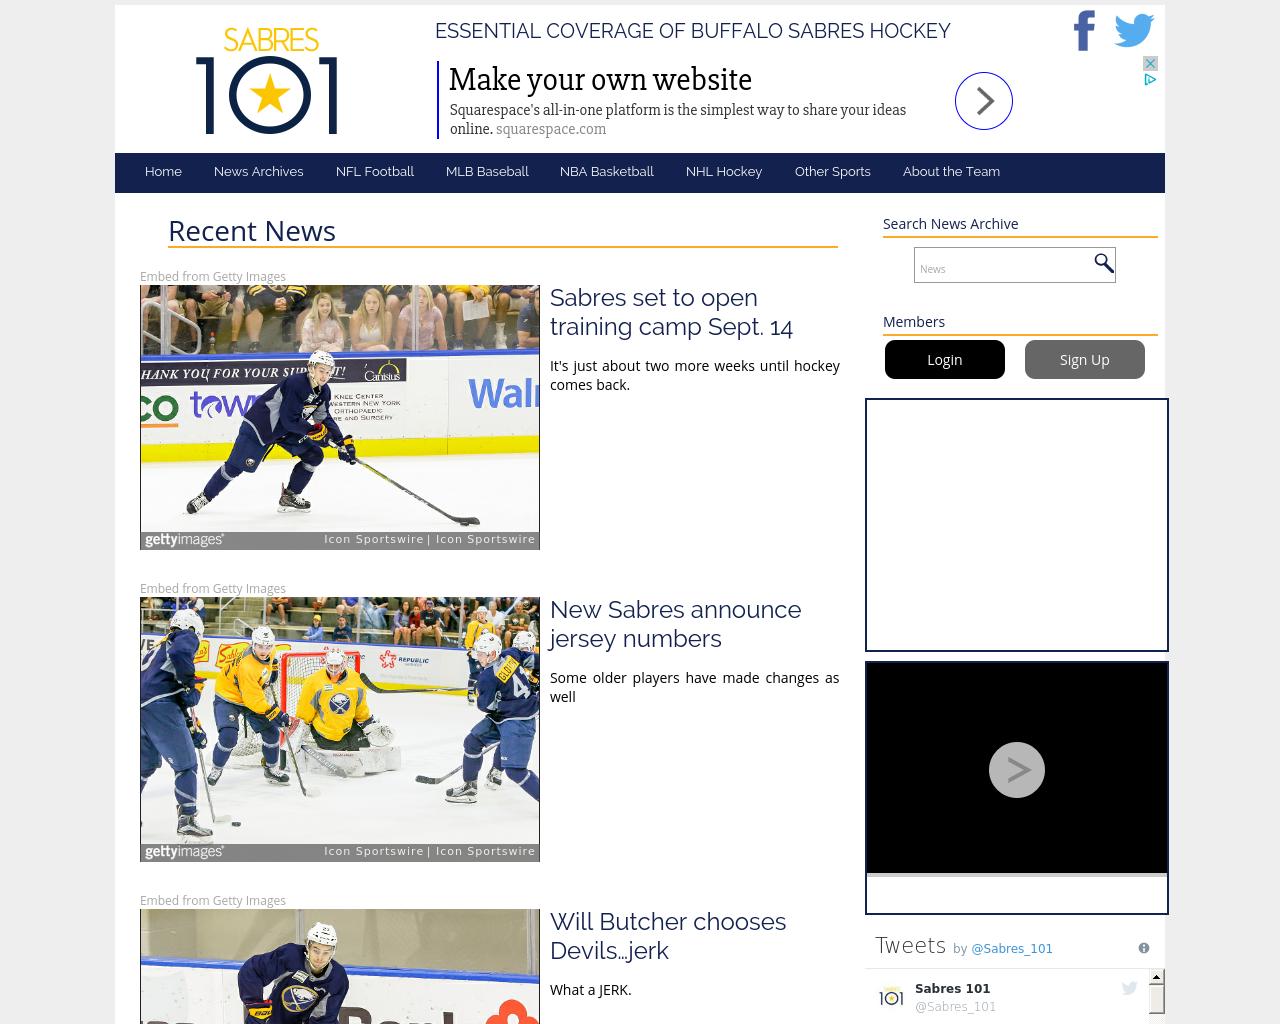 Sabres-101-Advertising-Reviews-Pricing